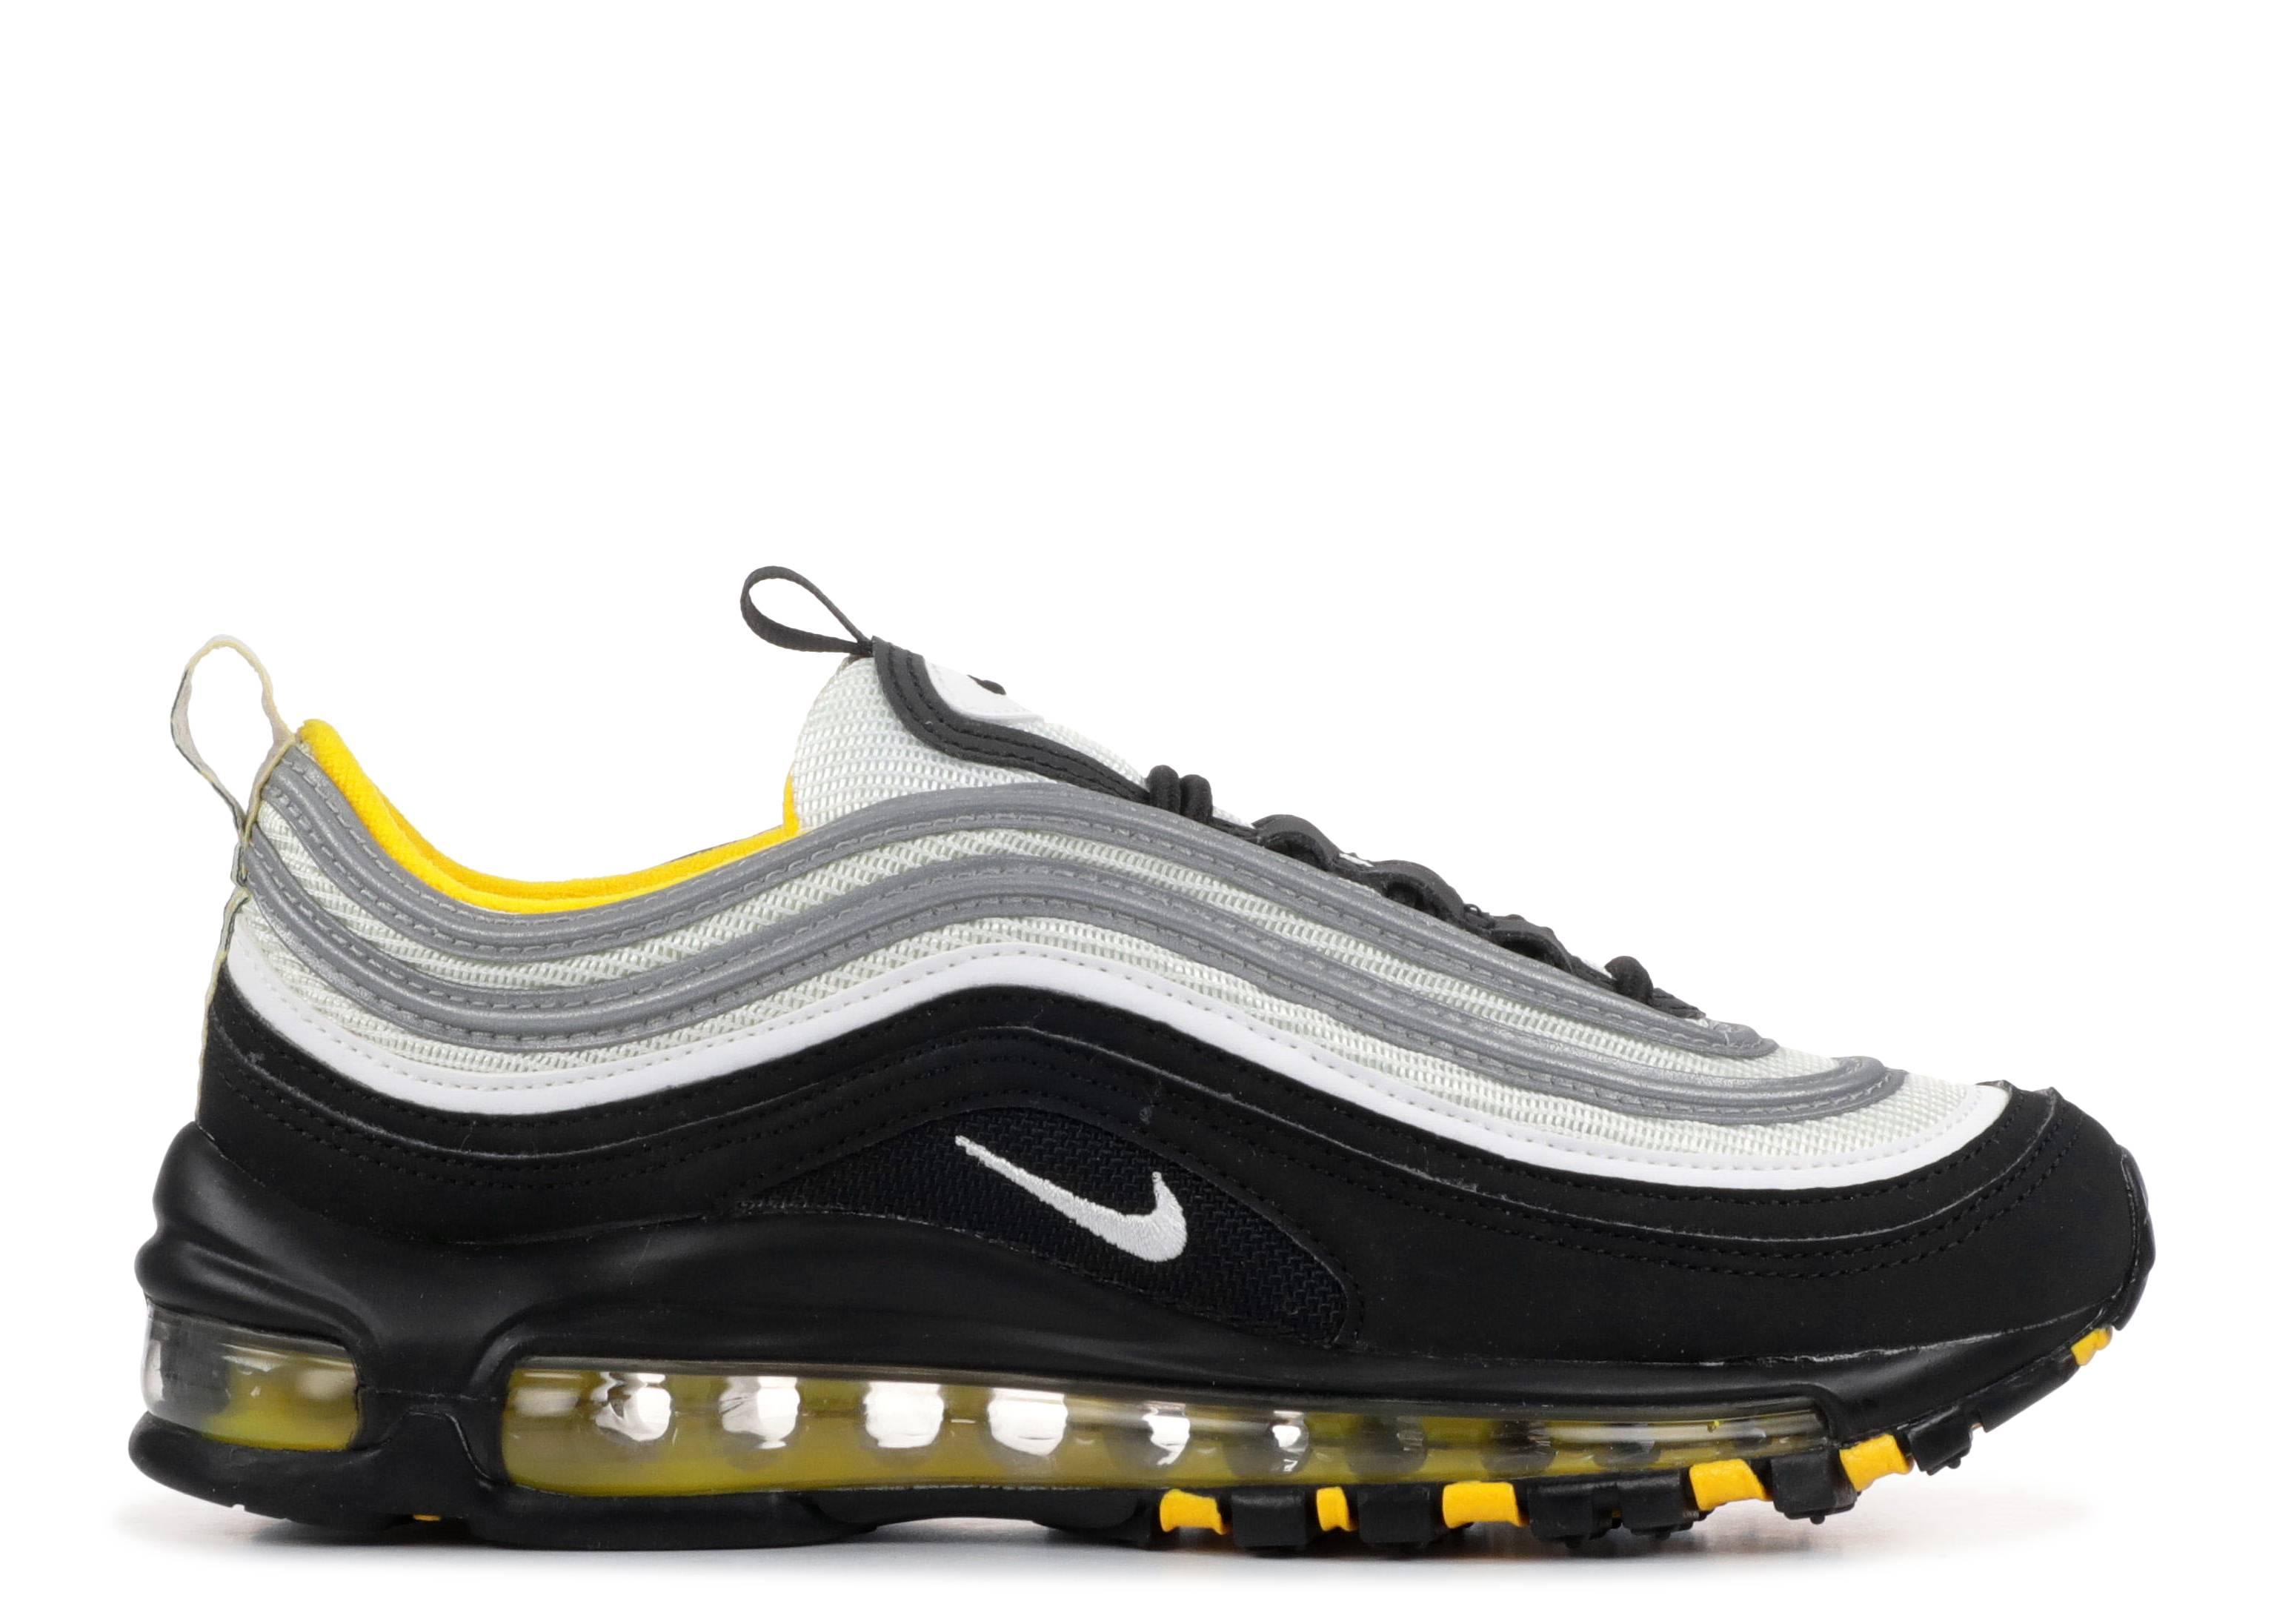 Nike Air Max 97 BlackWhiteAmarillo 921522 005 Men's Running Shoes 921522 005